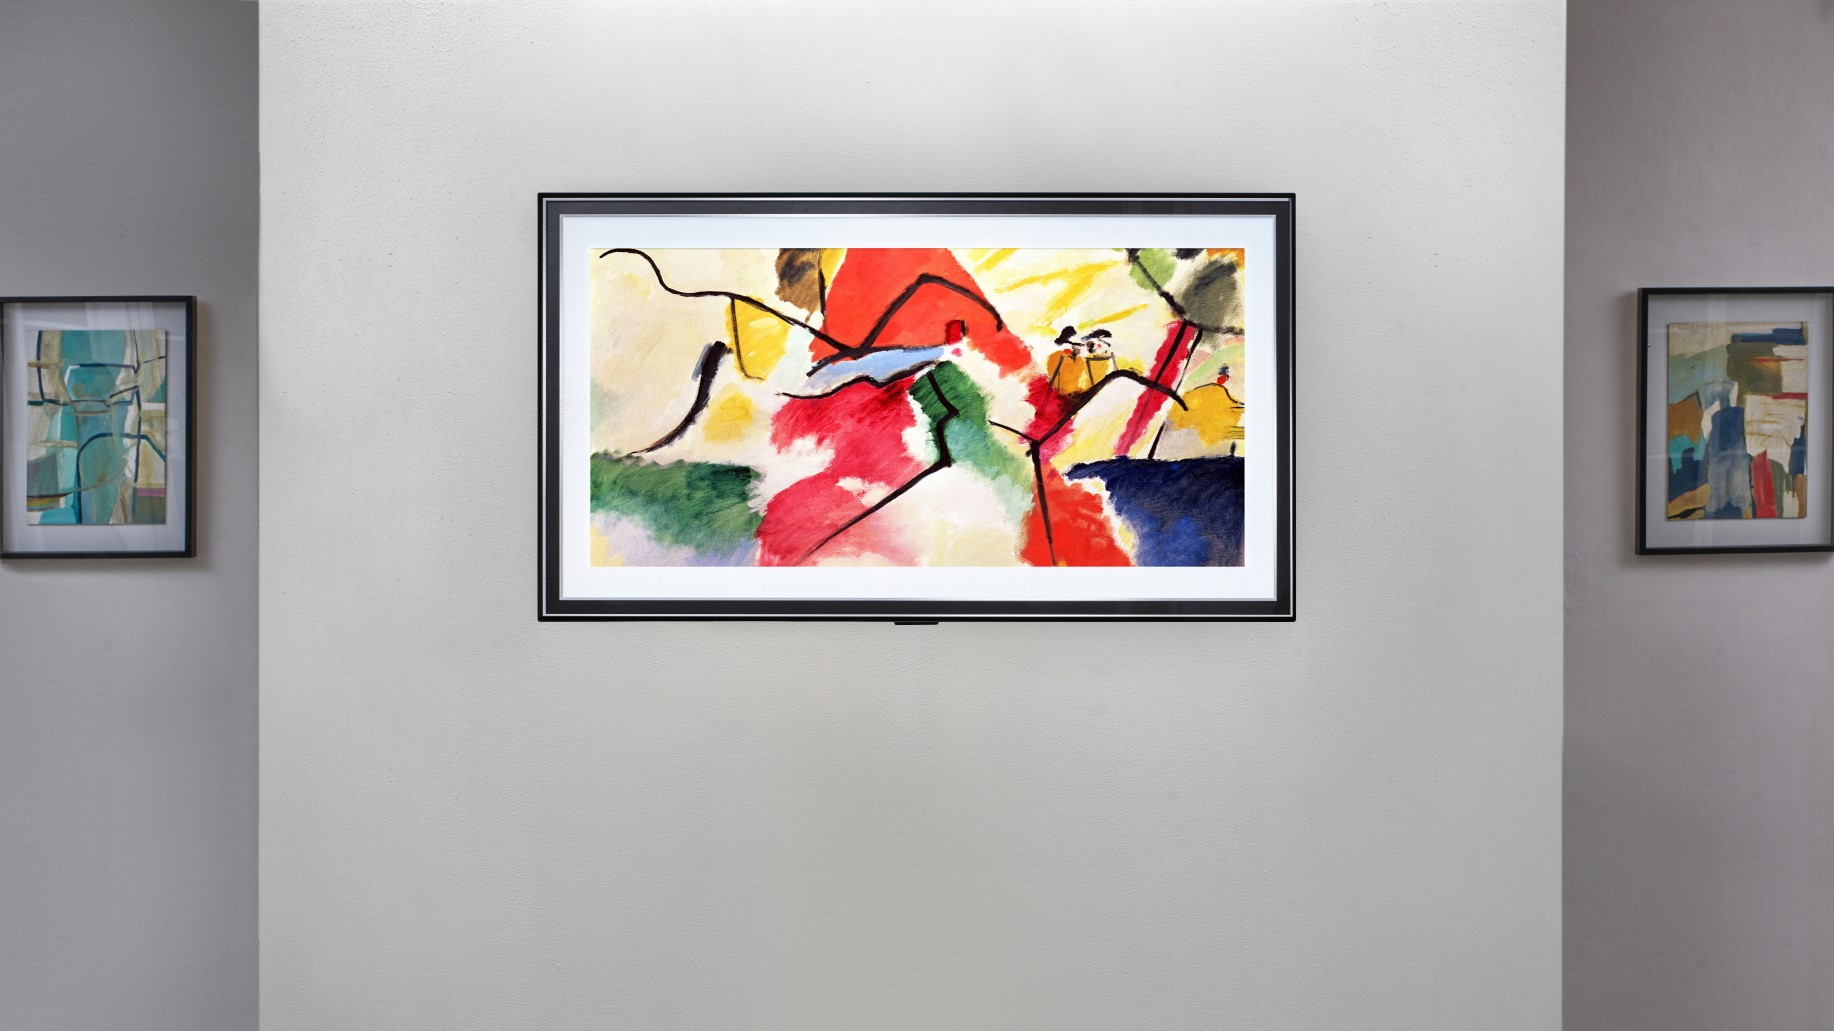 LG GX 'Gallery' Series OLED